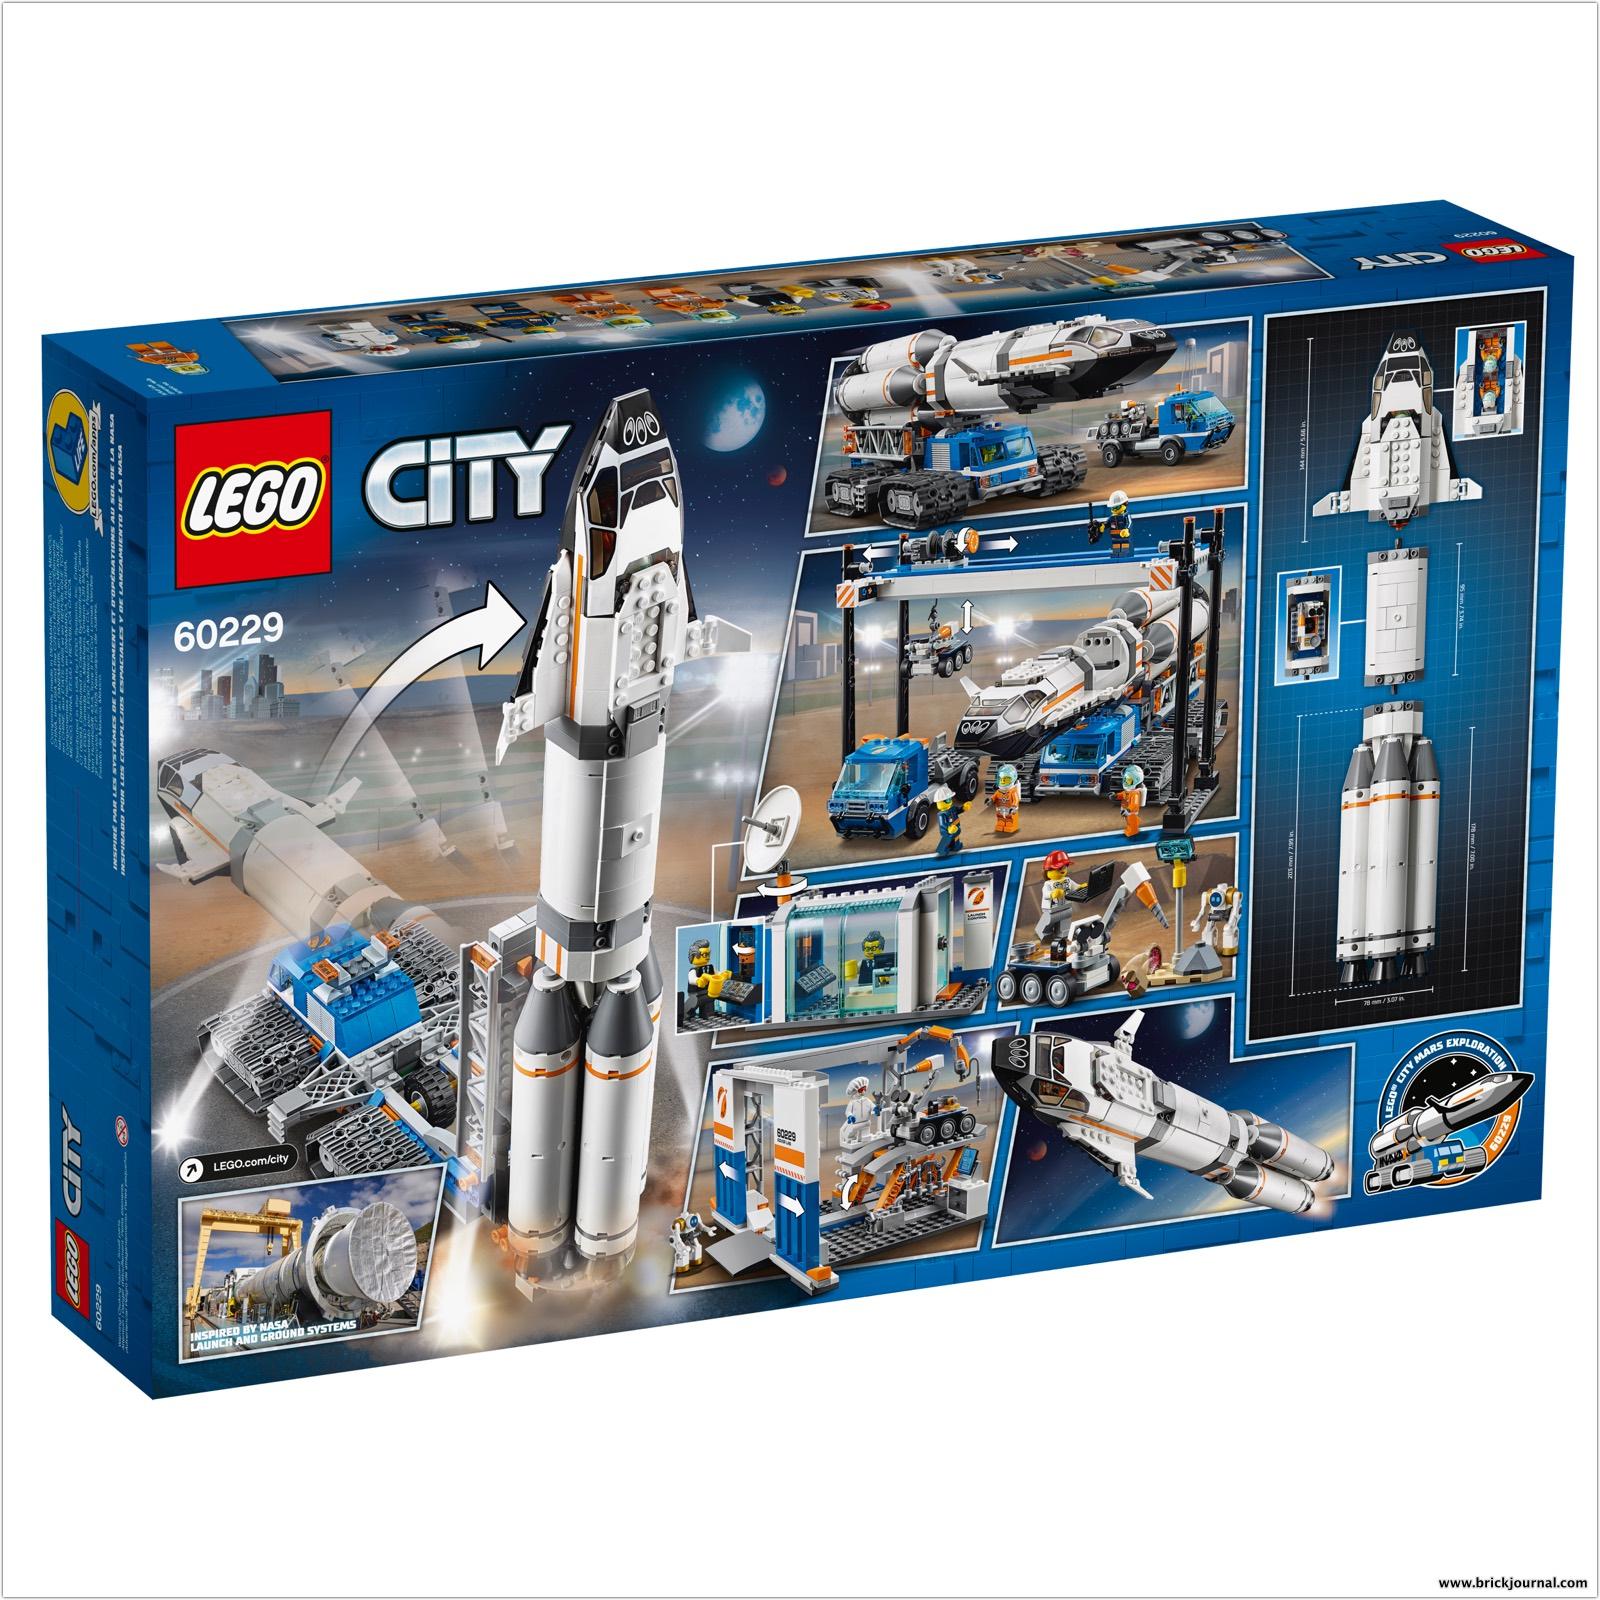 LEGO CITY Mars Exploration Sets Depict NASA's Future Ambition